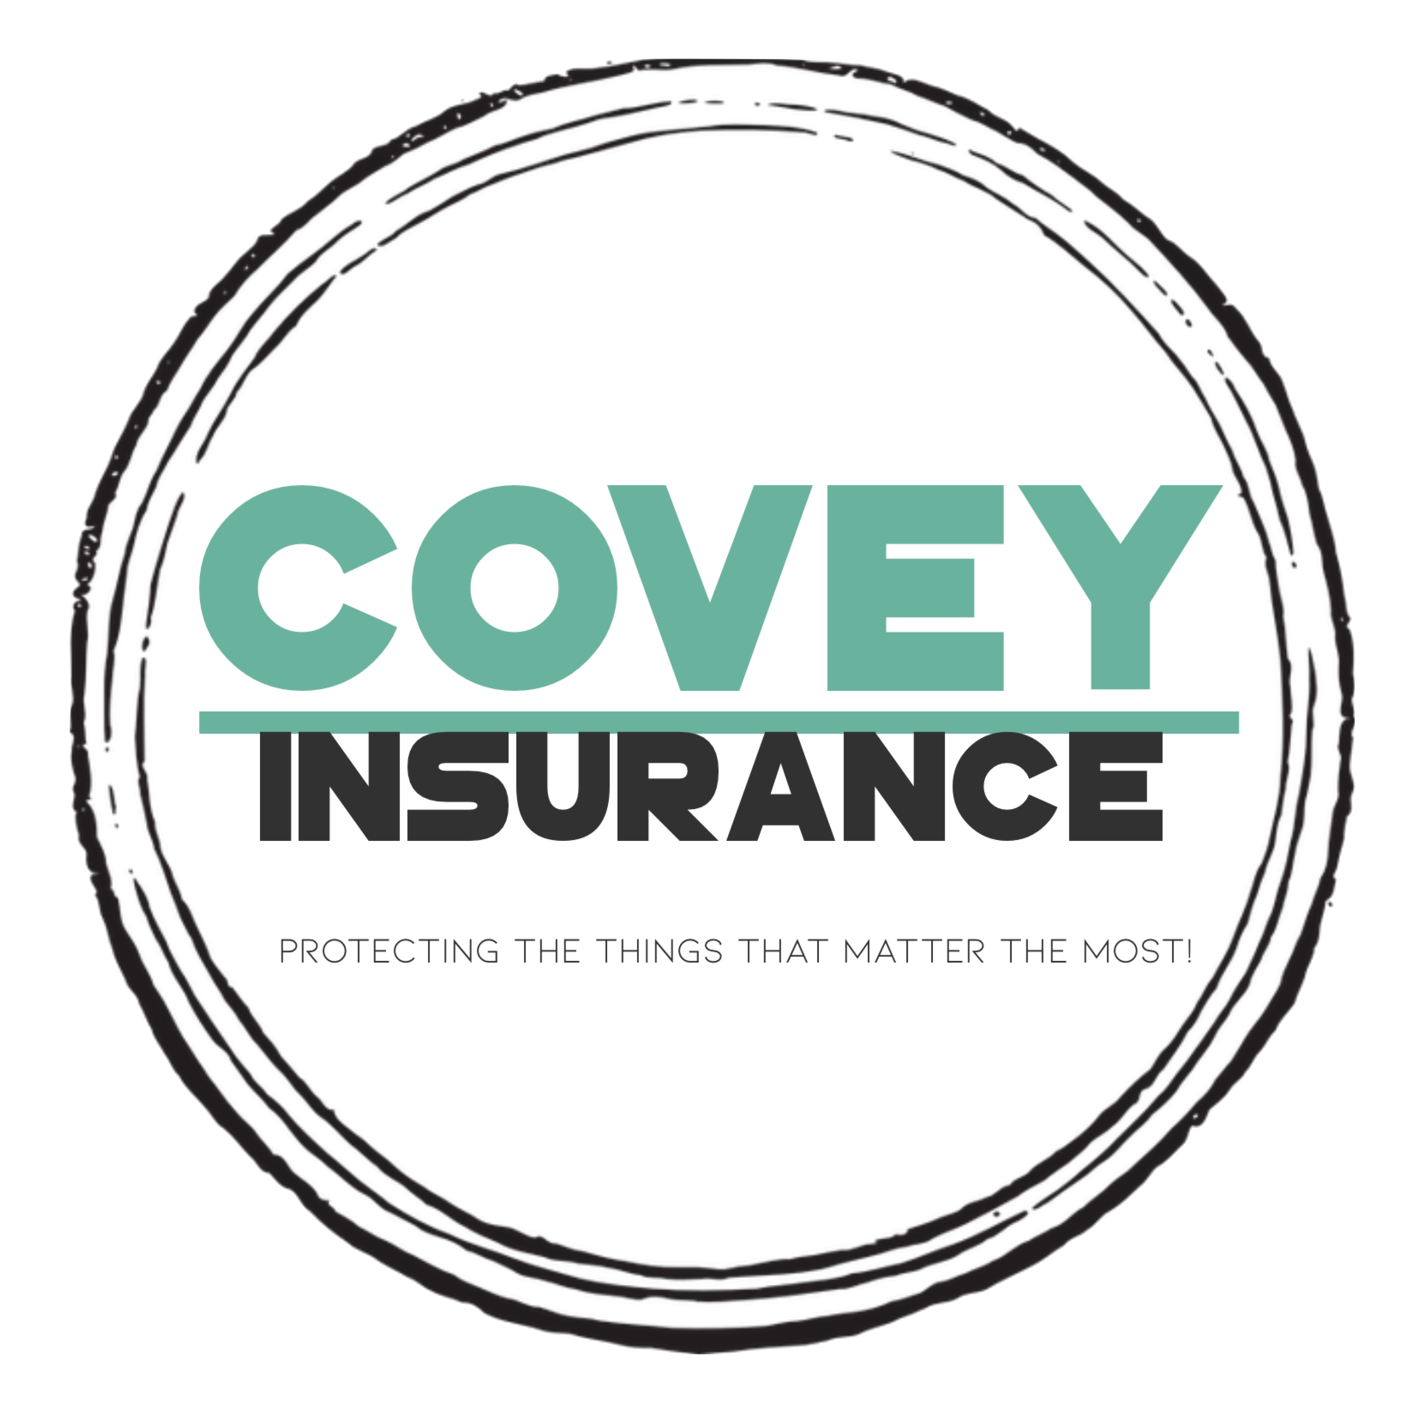 Covey Insurance image 1